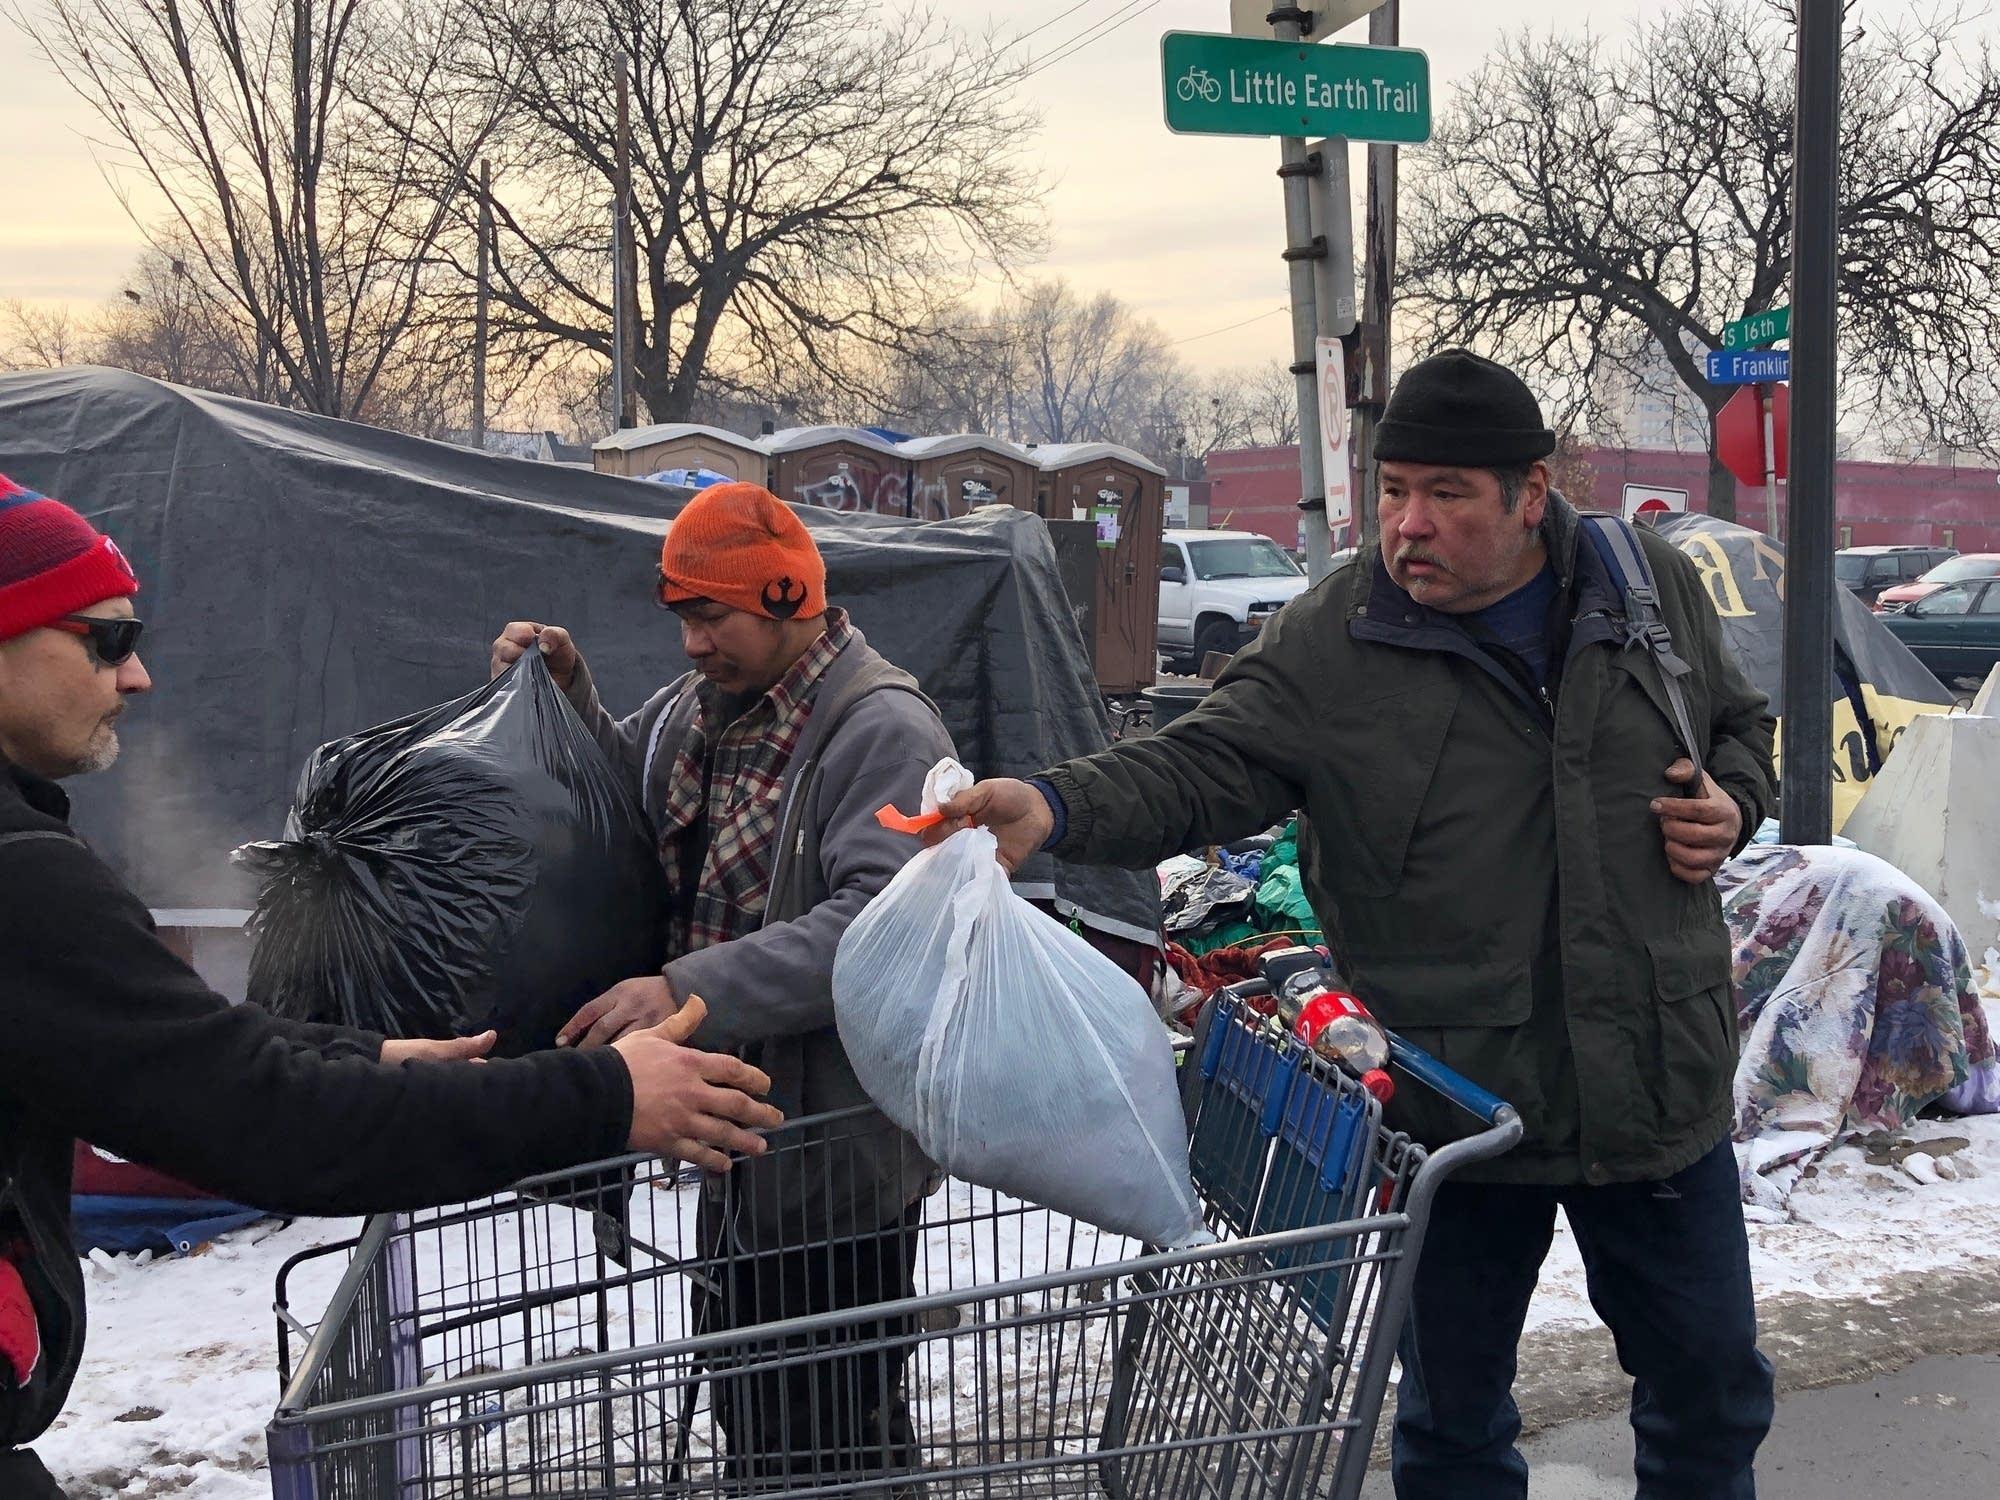 James Loerzel (right) packs up his belongings to move.